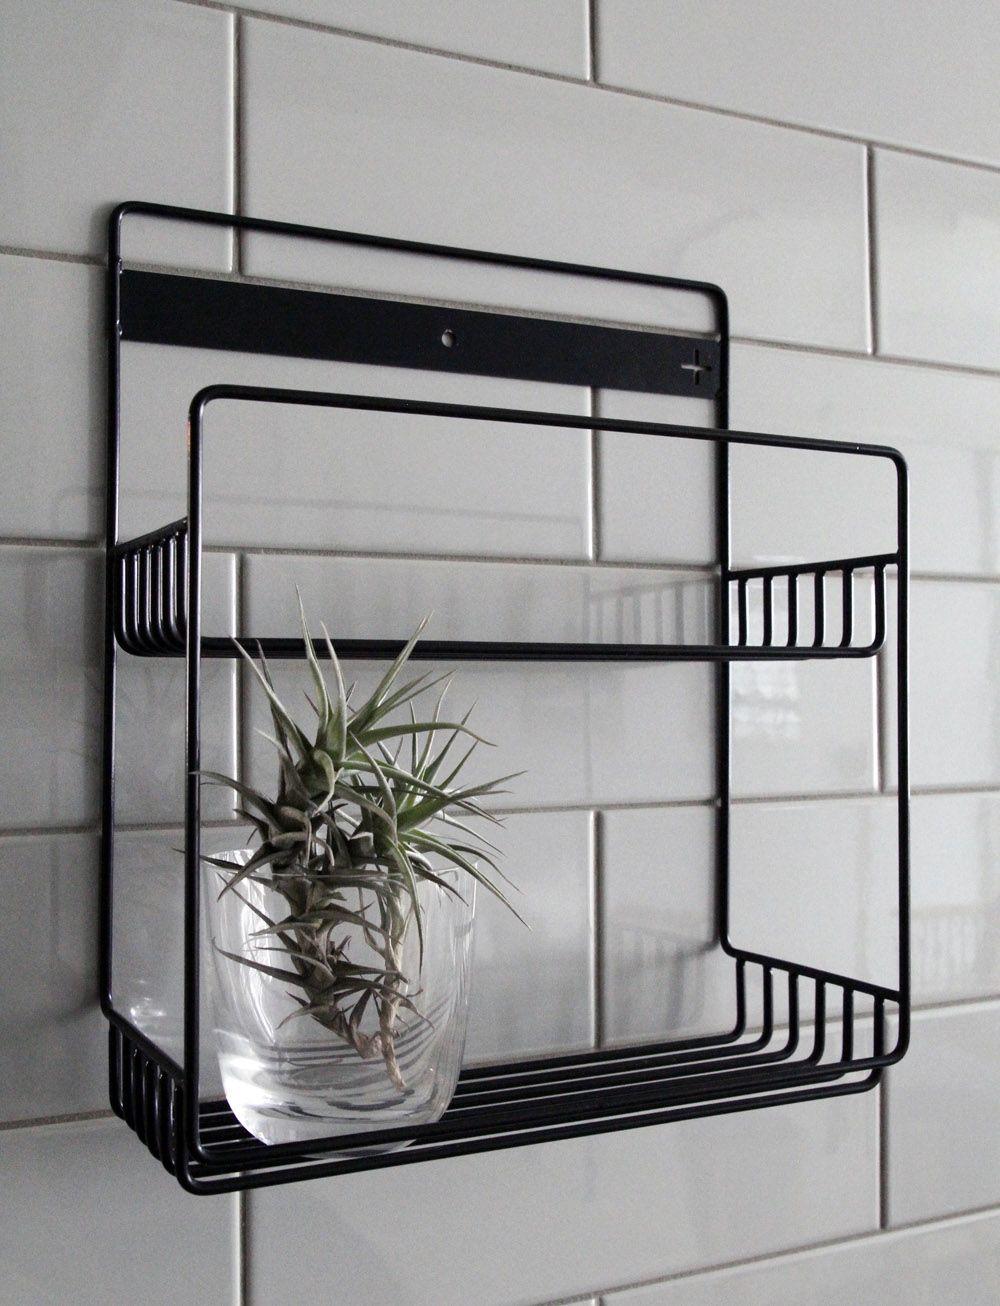 Wire Shelf Wire shelving, Shelves, Storage